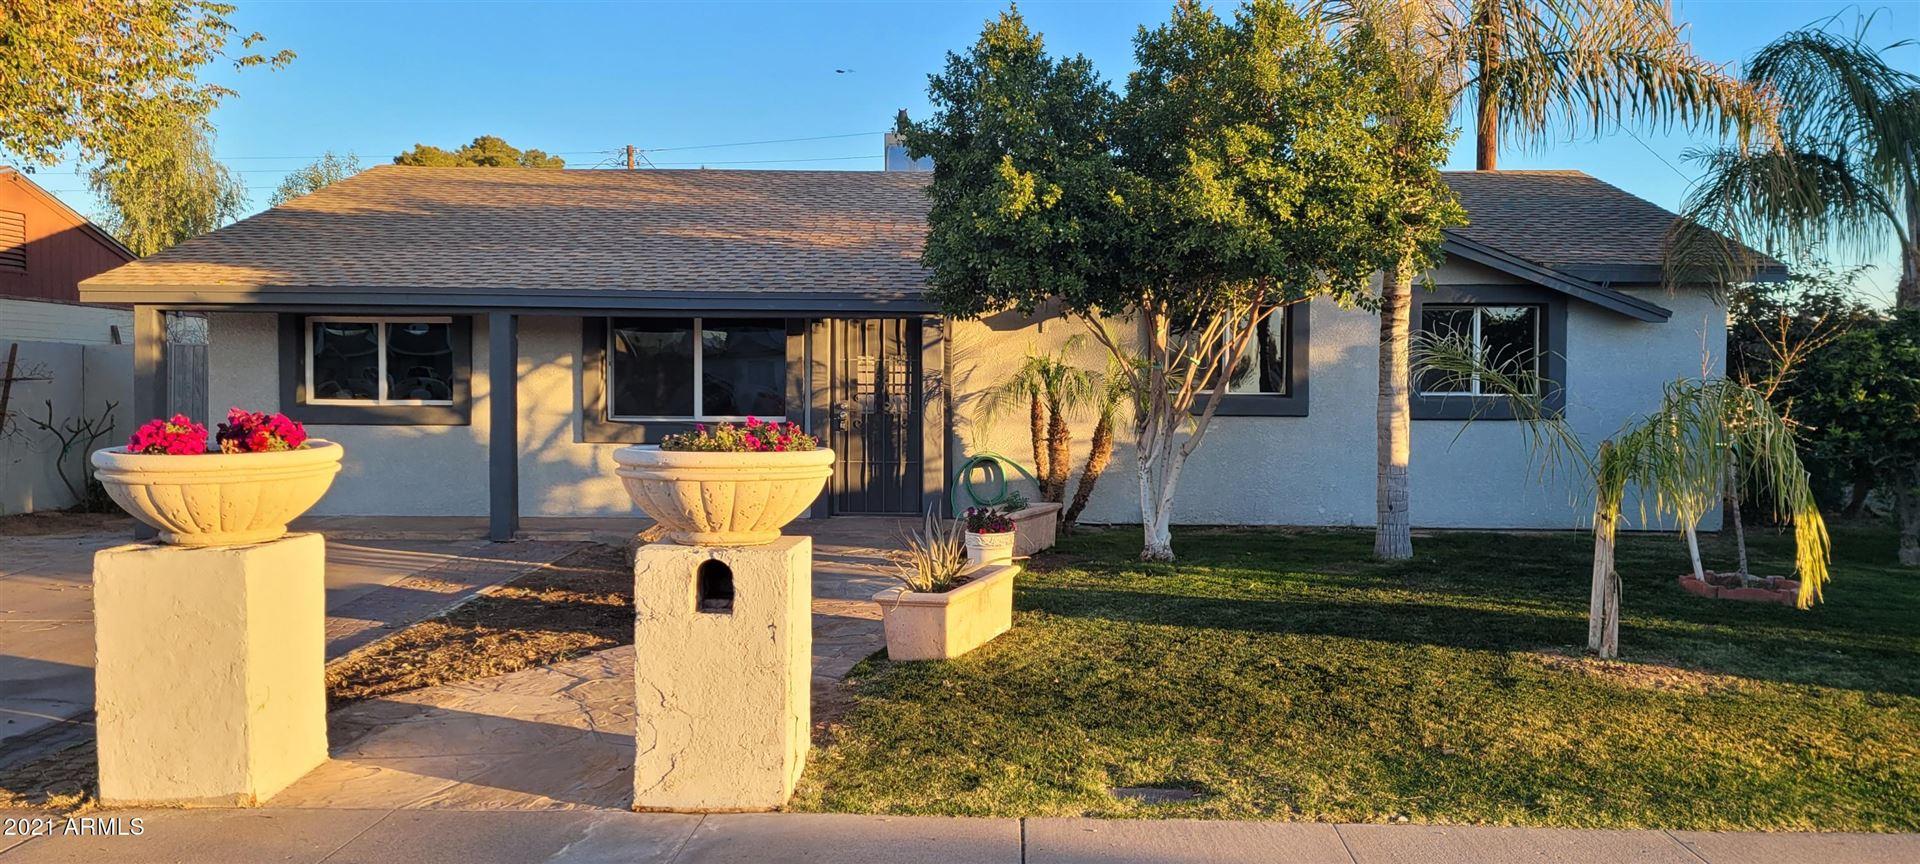 7914 W CLARENDON Avenue, Phoenix, AZ 85033 - MLS#: 6163544